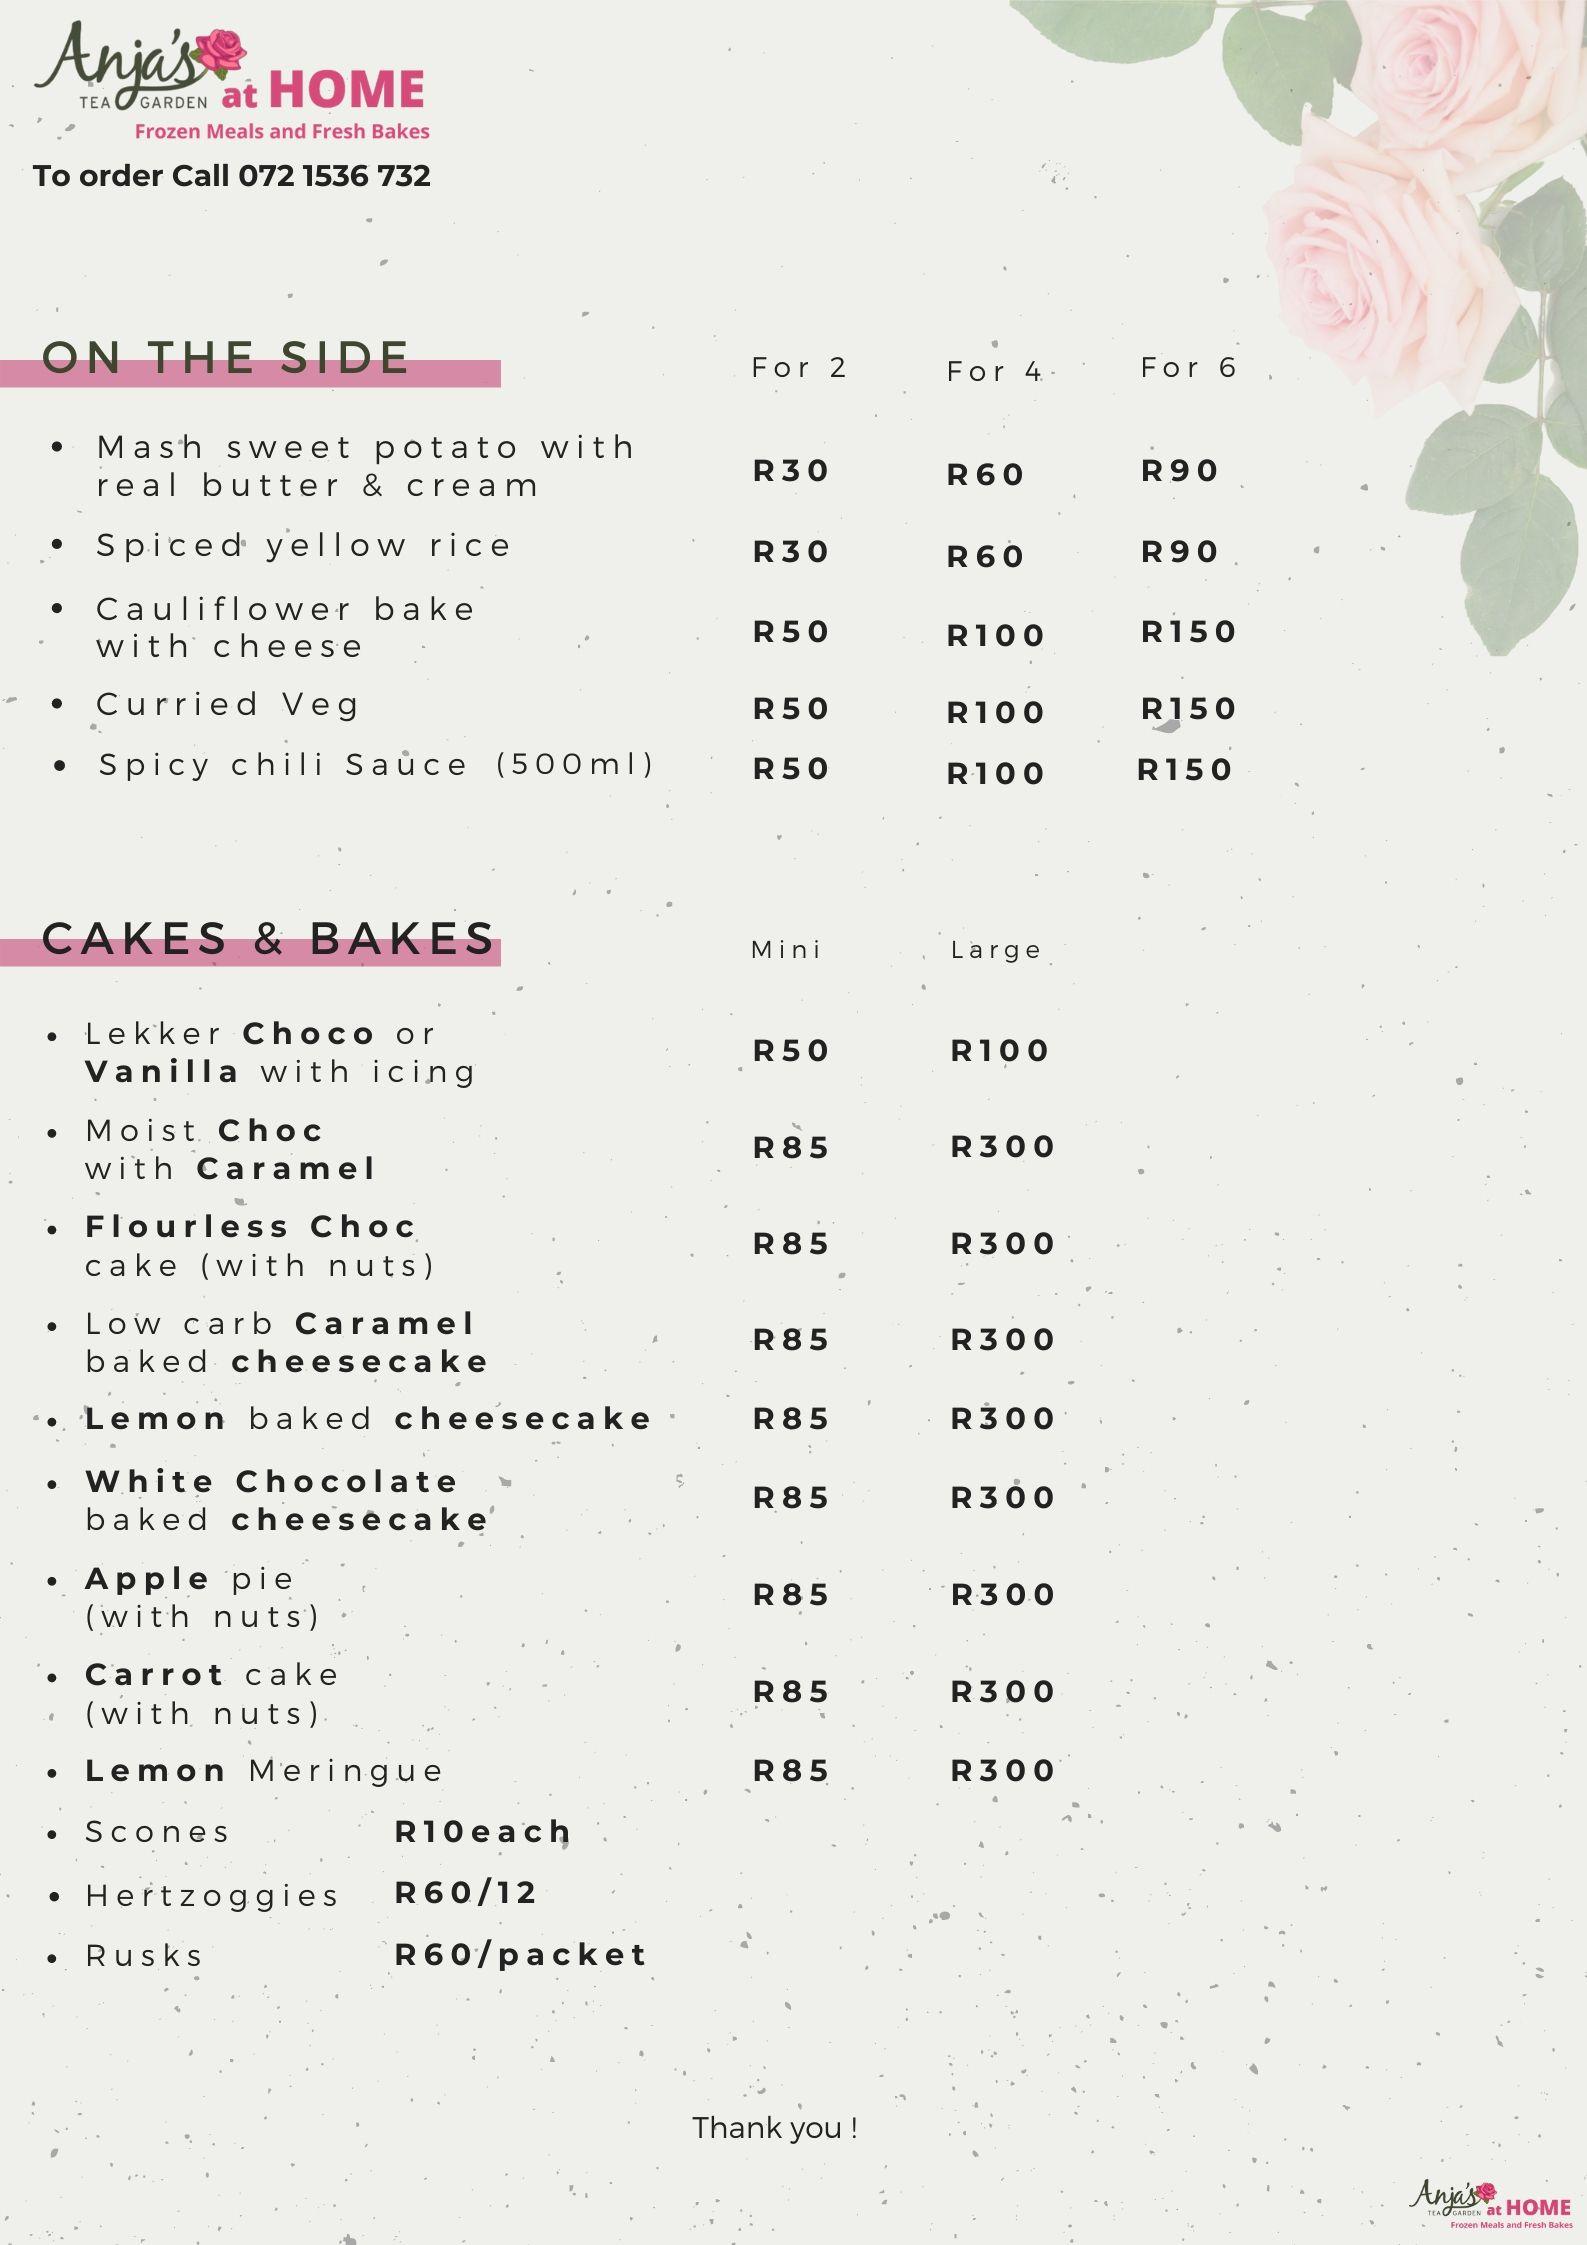 Frozen meals and fresh bakes menu p2